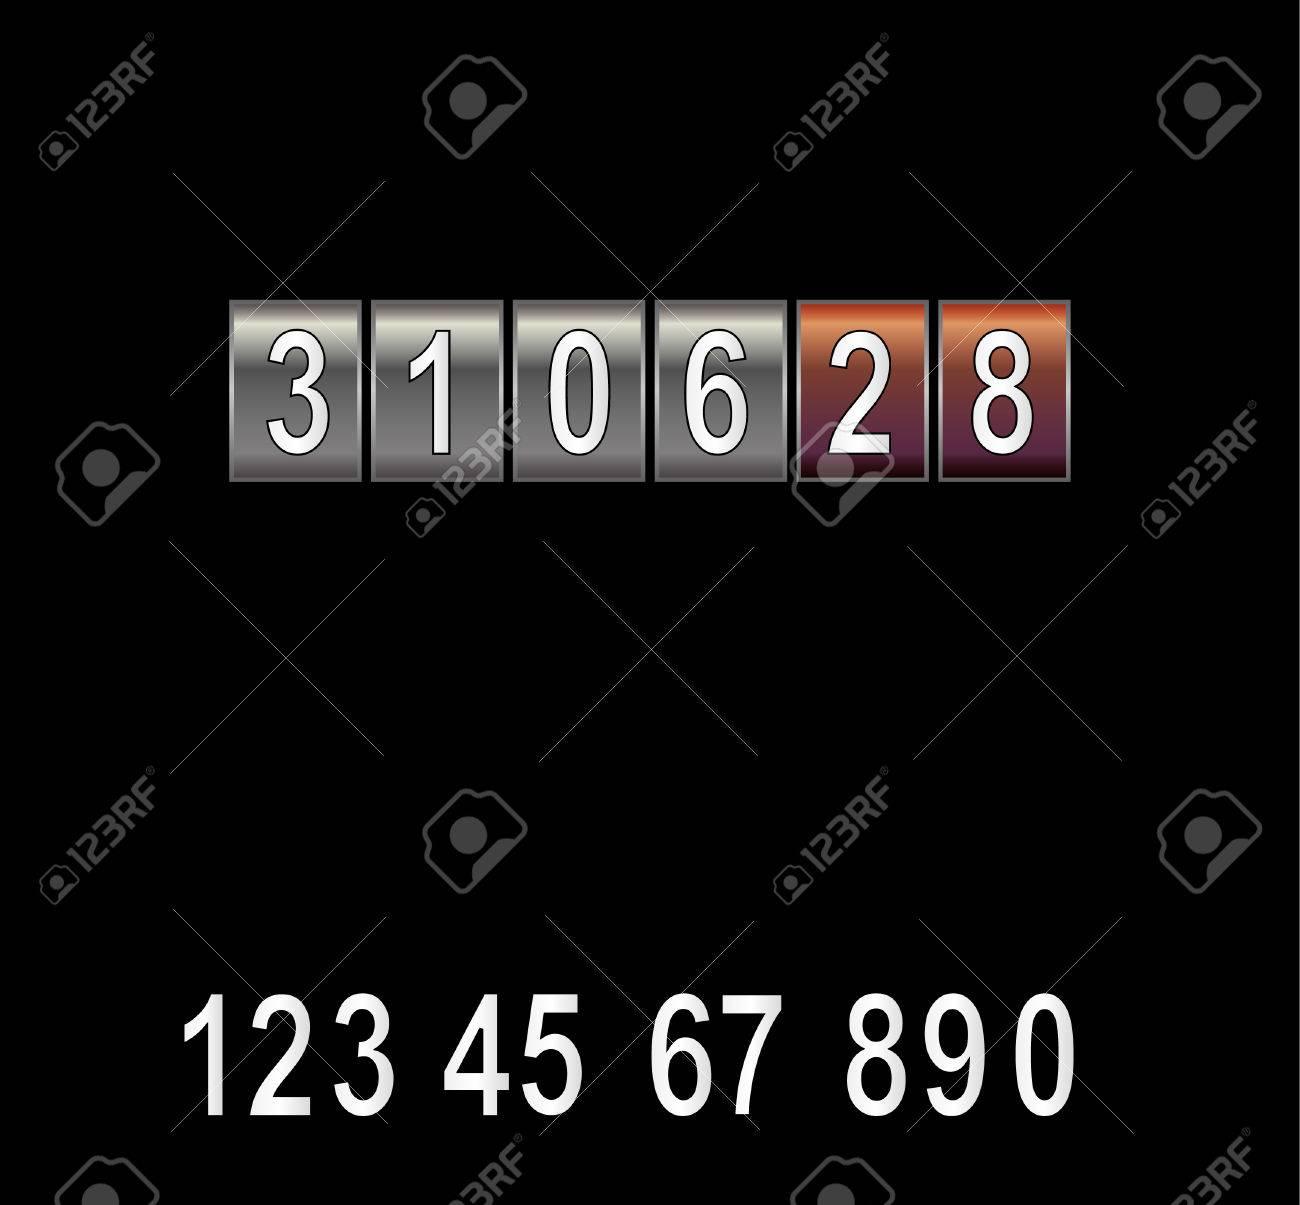 Counter. Vector illustration Stock Vector - 5705615